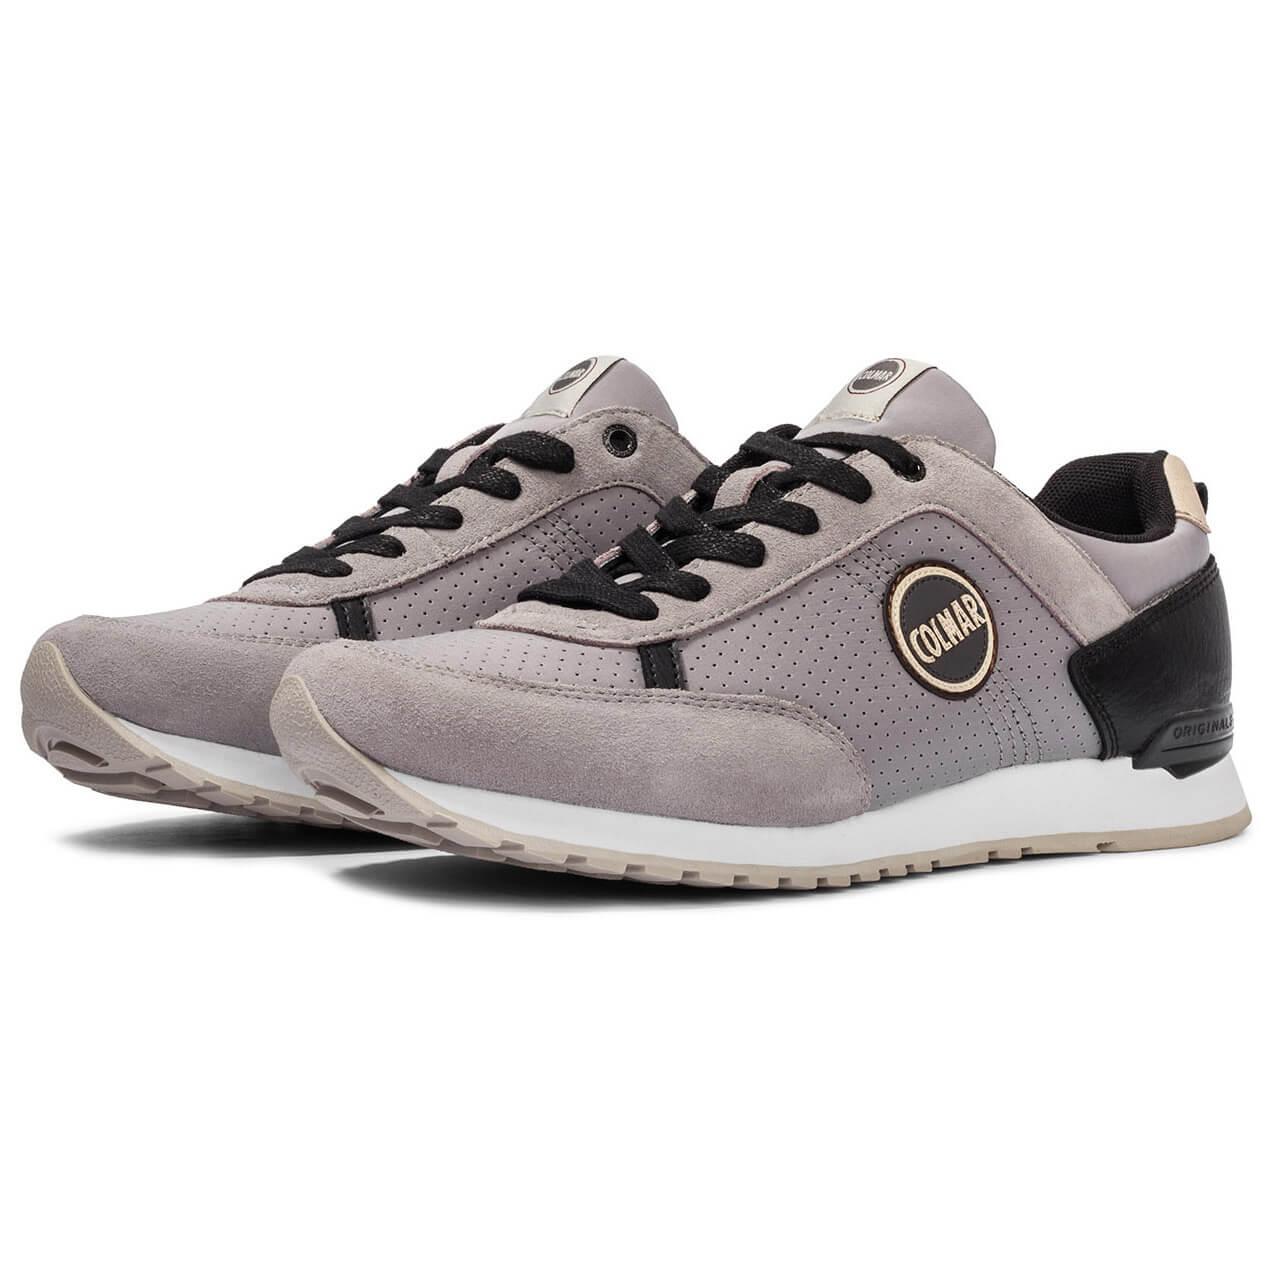 19dd42c8f9 Colmar Originals - Travis Drill - Sneakers